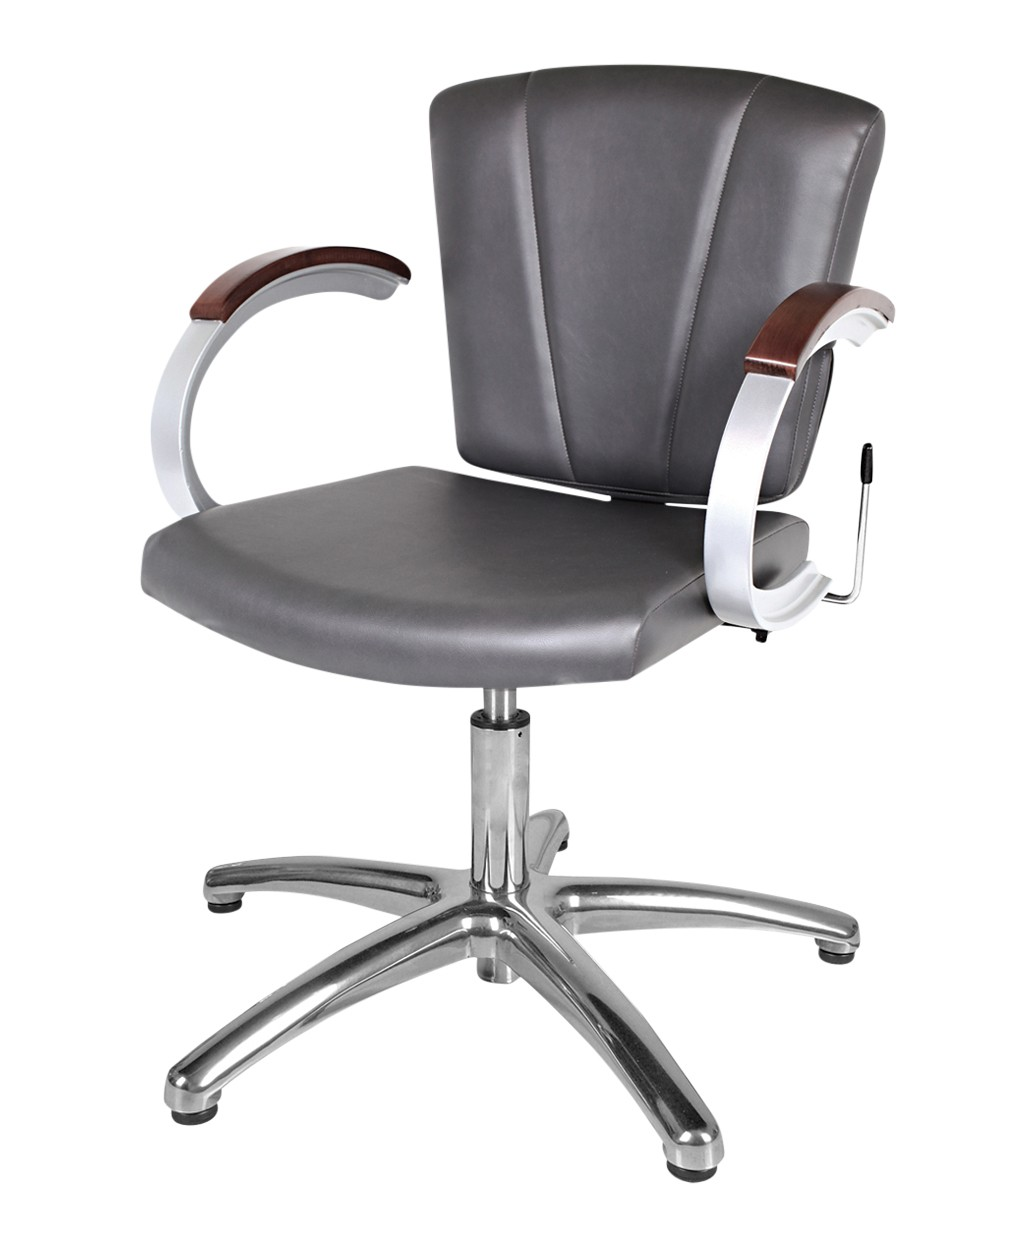 Collins 9731L Vanelle Lever-Control Shampoo Chair